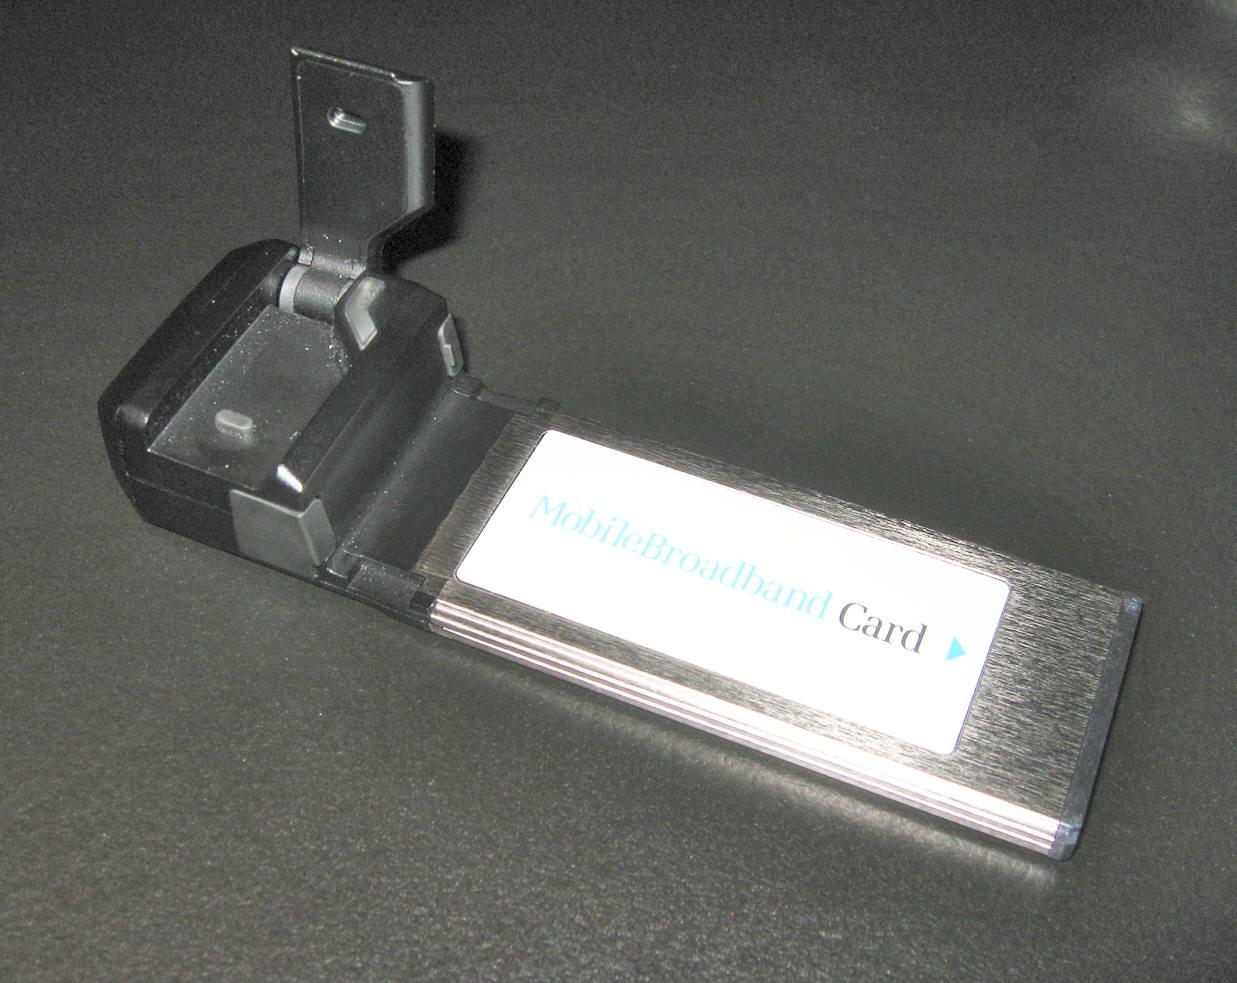 mobilebroadbandmodeminthexpressardformfactorforlaptopcomputers